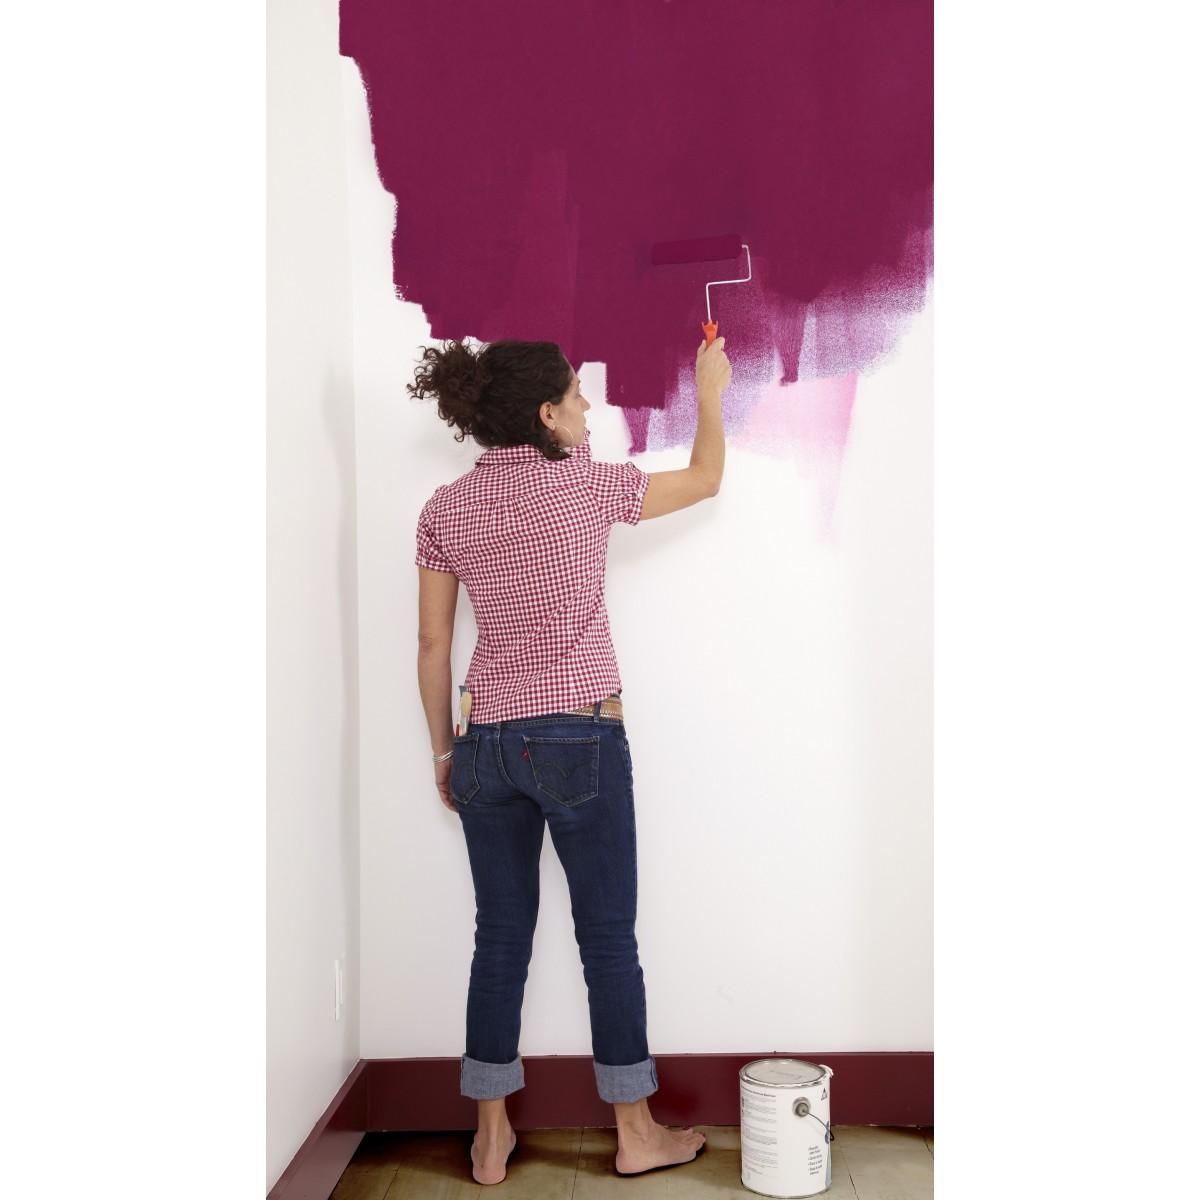 Temporary Wallpaper Design Ideas HGTV Design Blog Design Happens 1200x1200